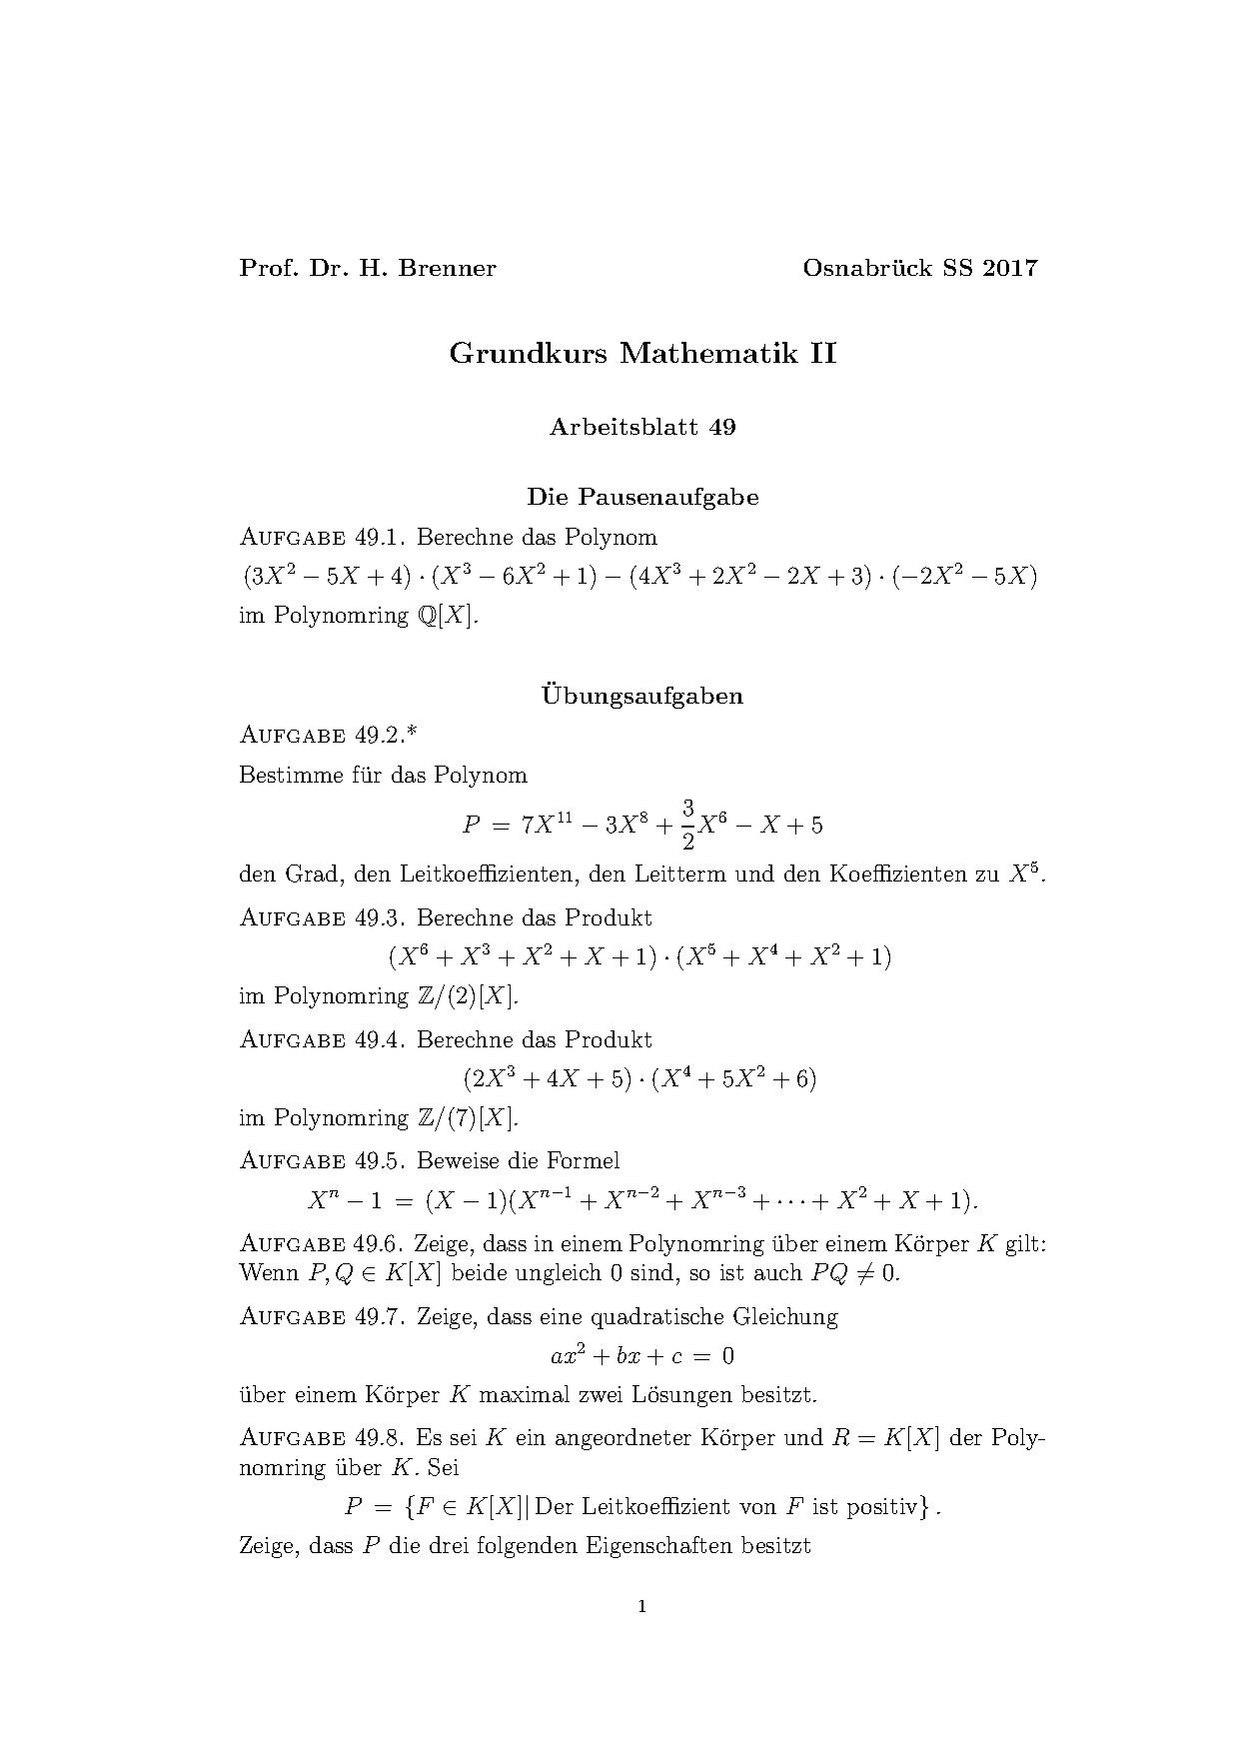 Charmant Mathe Arbeitsblatt Polynome Ideen - Gemischte Übungen ...